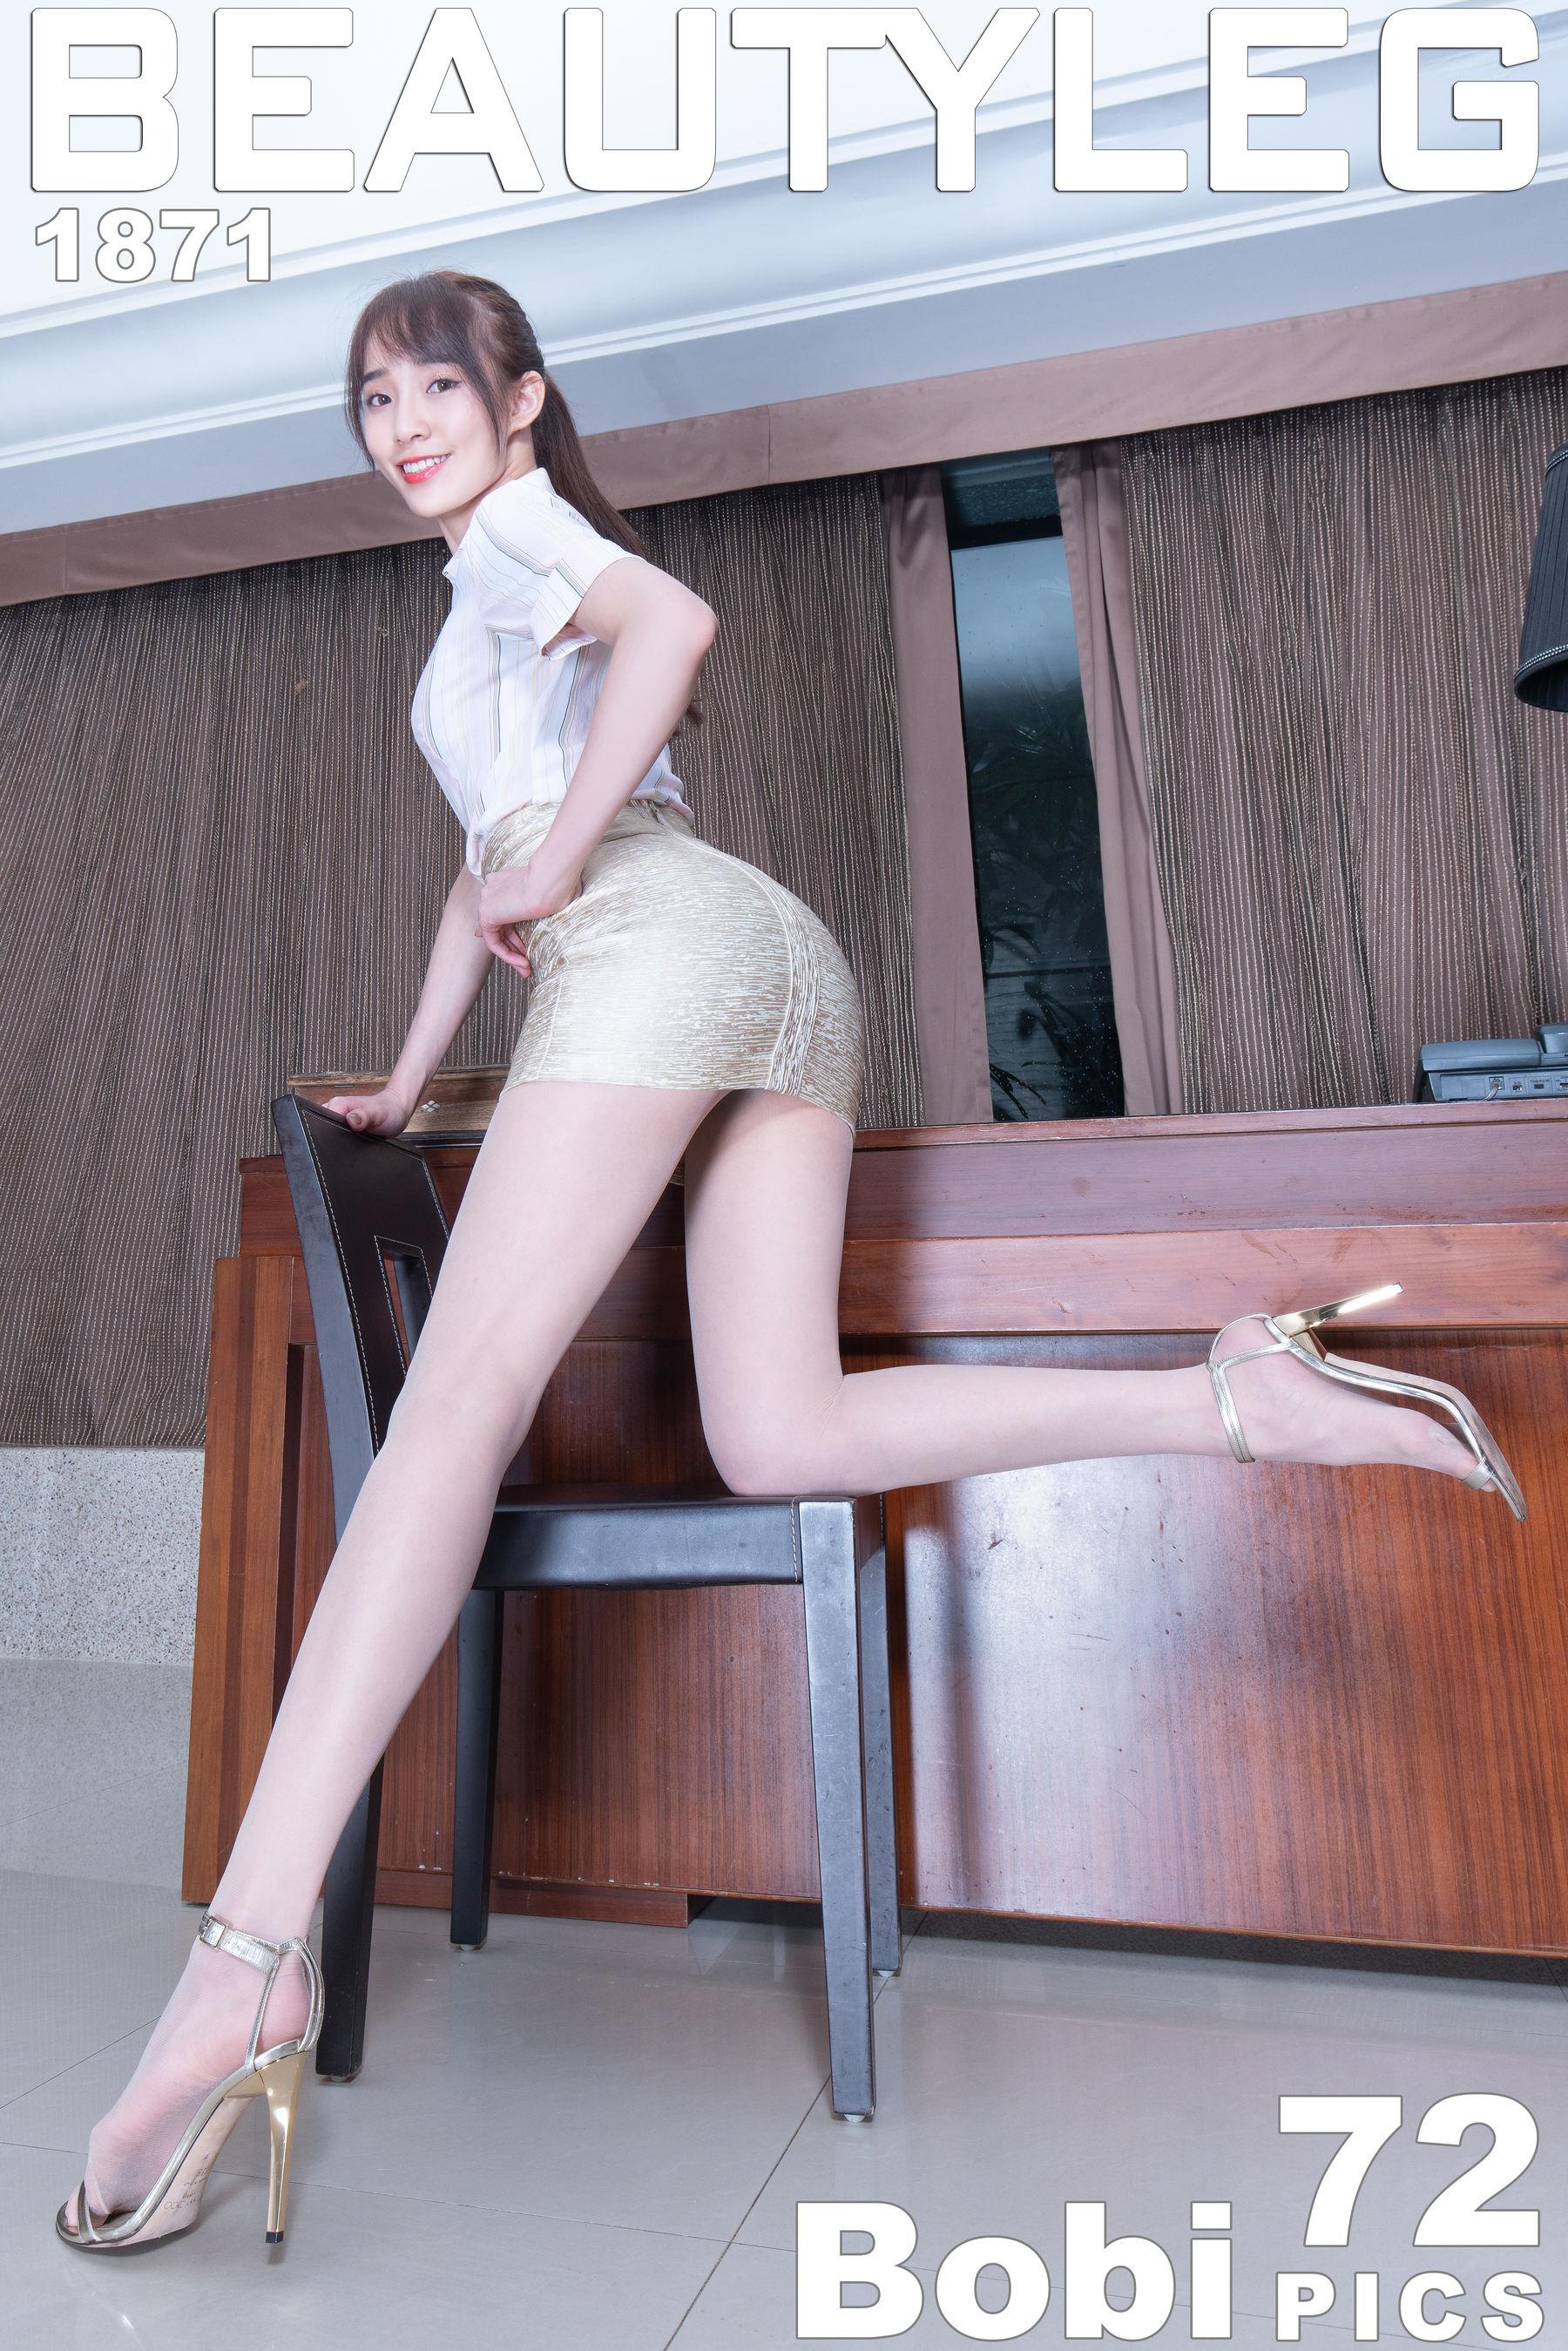 VOL.339 [Beautyleg]制服美腿高跟:腿模Bobi(Beautyleg Bobi)超高清个人性感漂亮大图(72P)